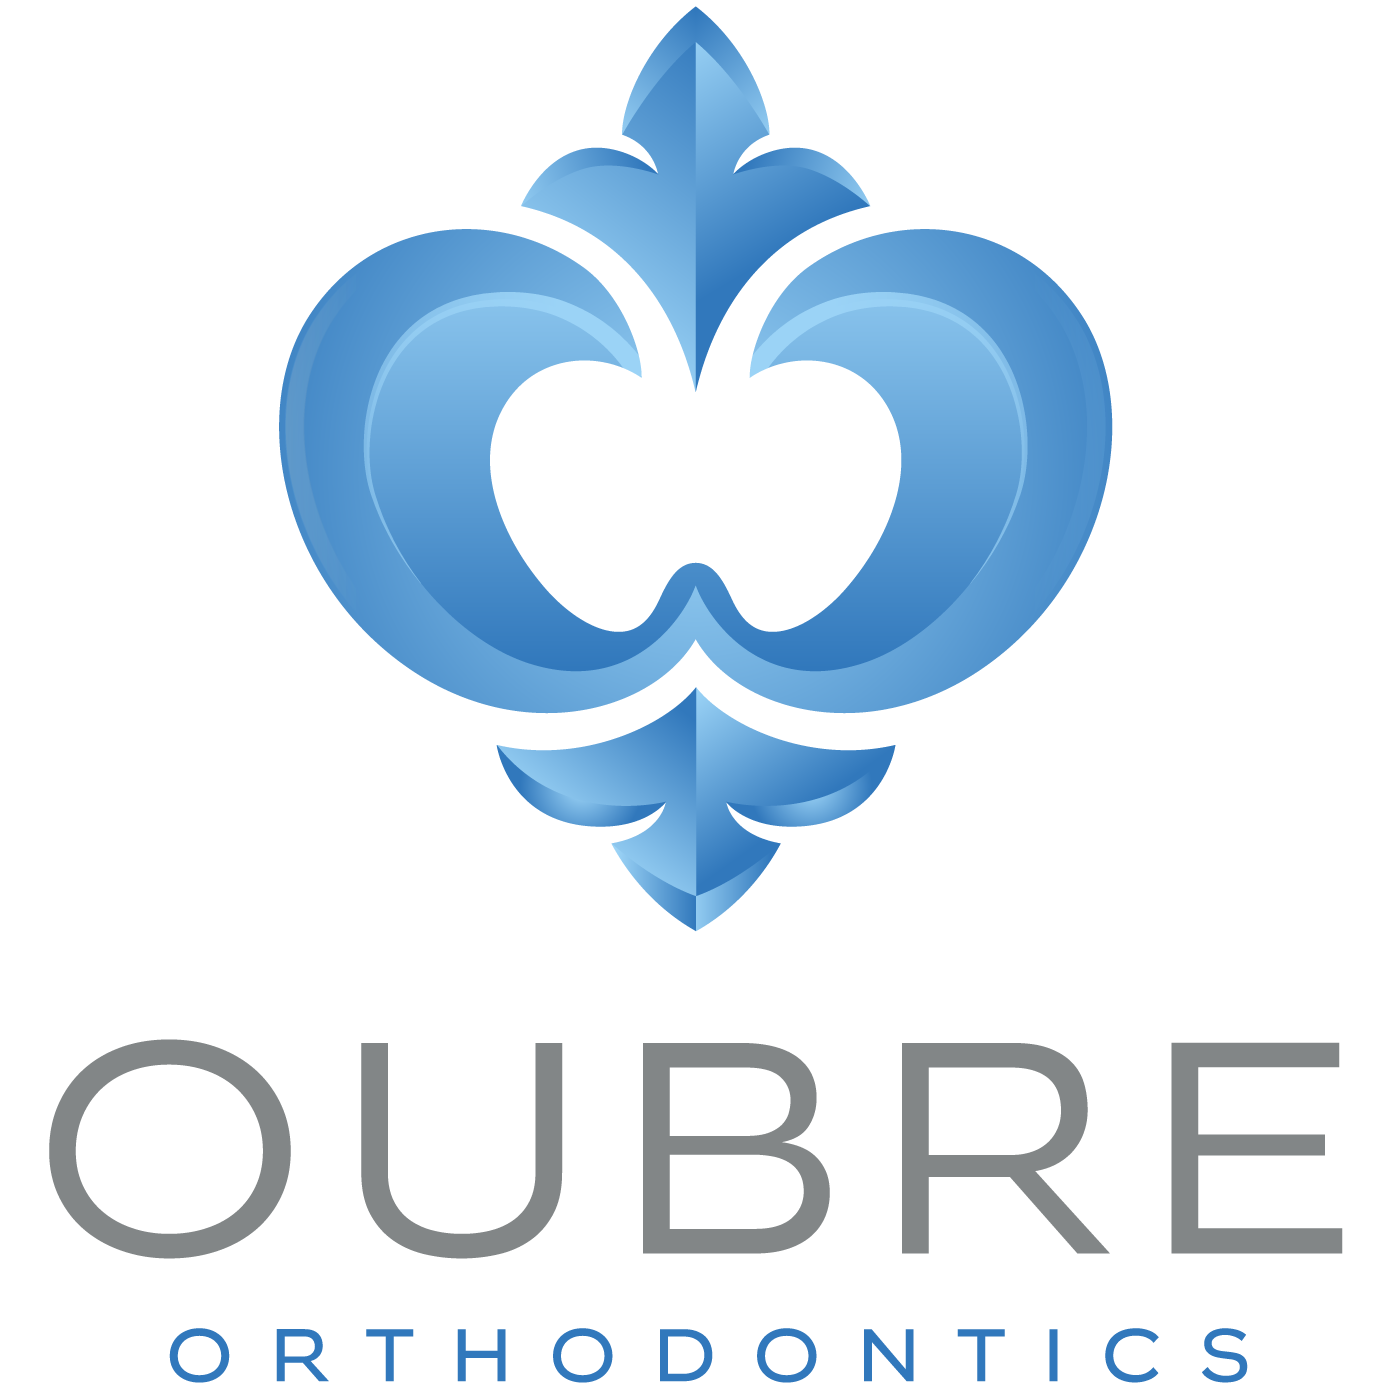 Oubre Orthodontics - Lafayette, LA - Dentists & Dental Services